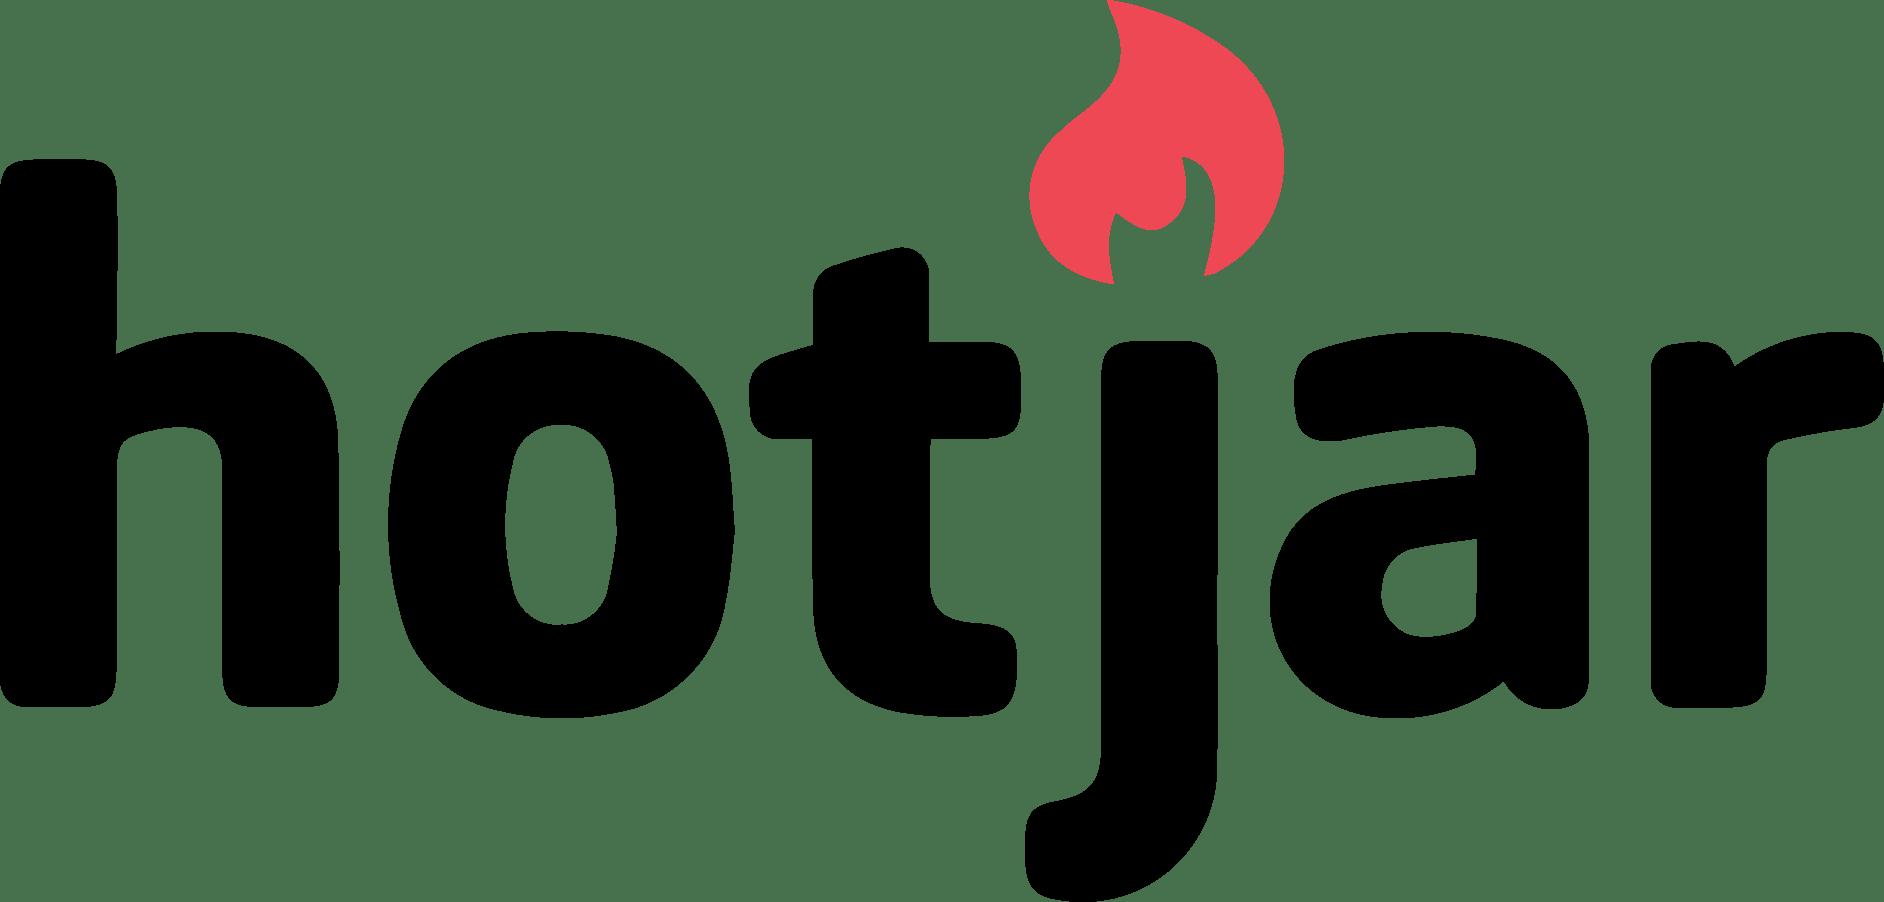 hotjar-logo.png